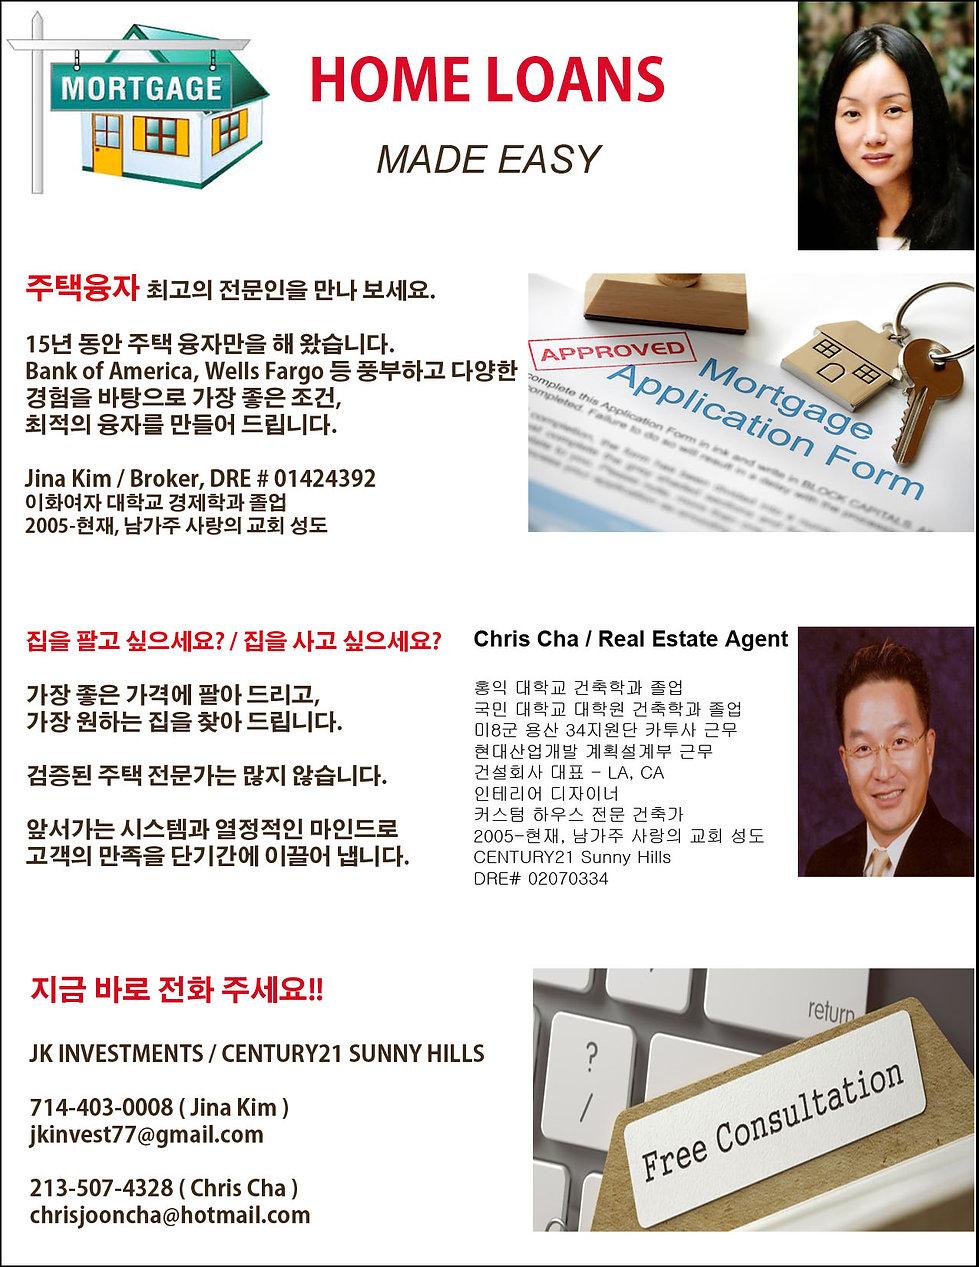 loan ad-with chris-century21.jpg